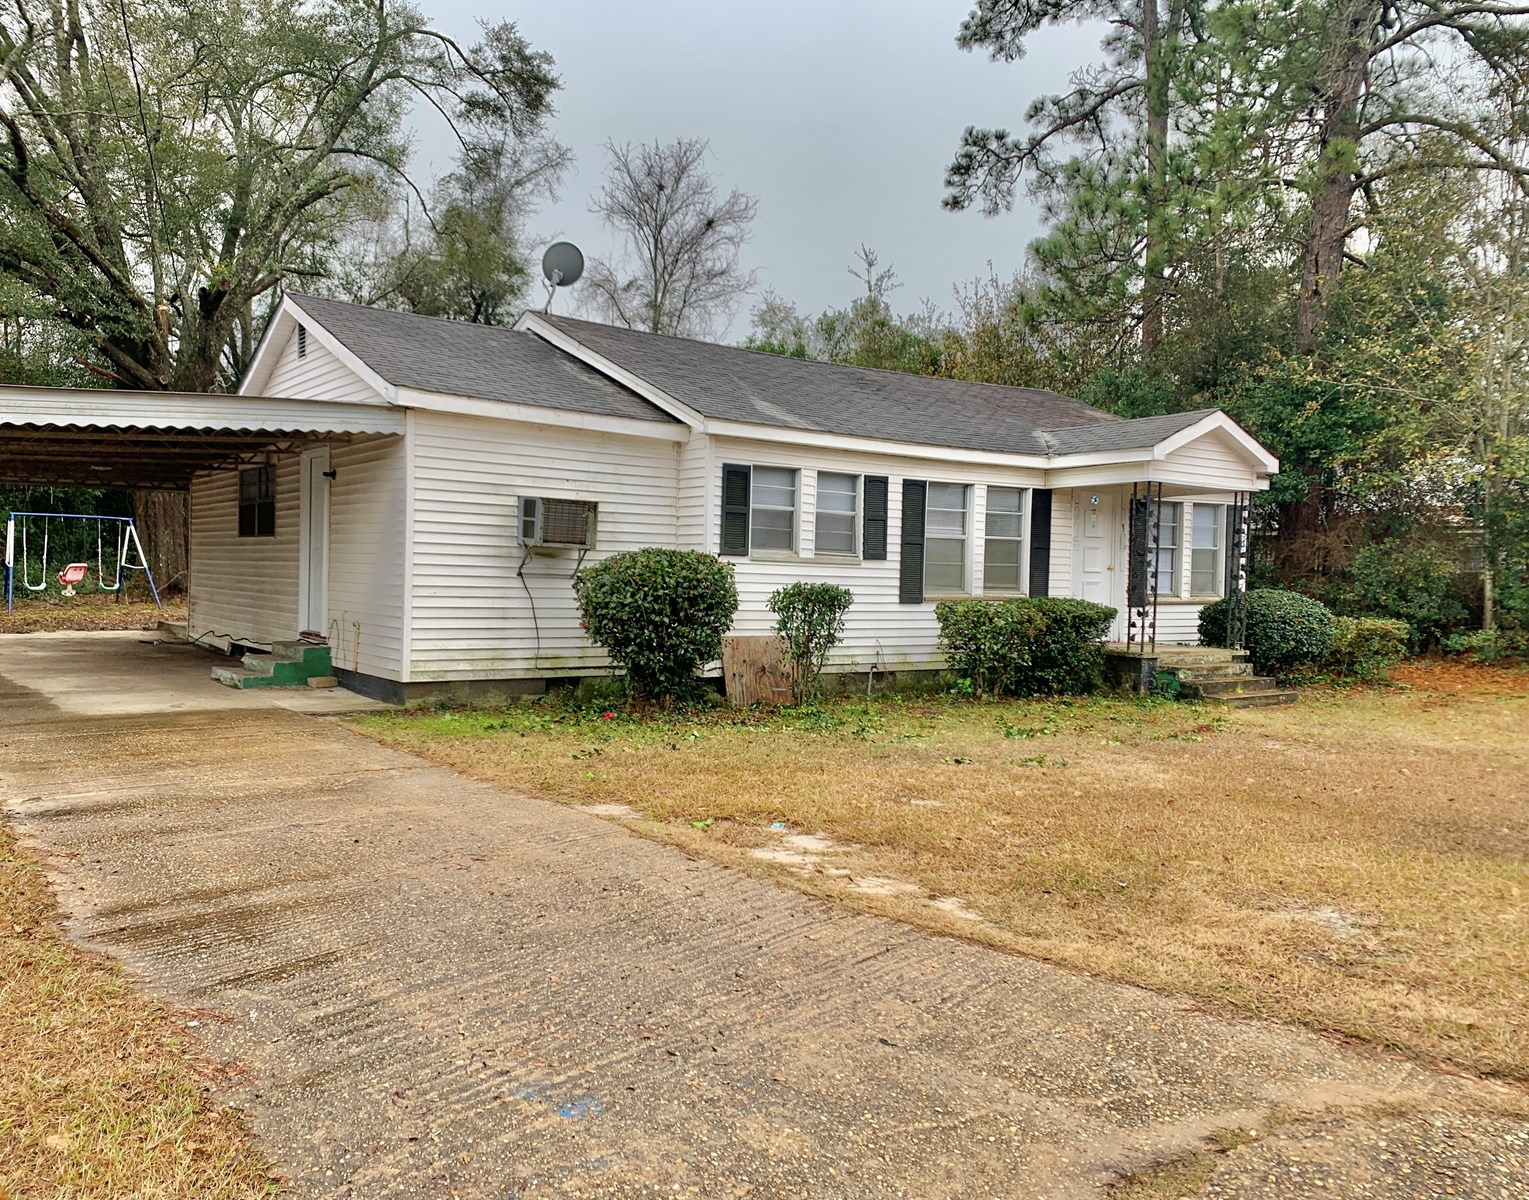 Home For Sale Geneva Alabama - David Miller United Country